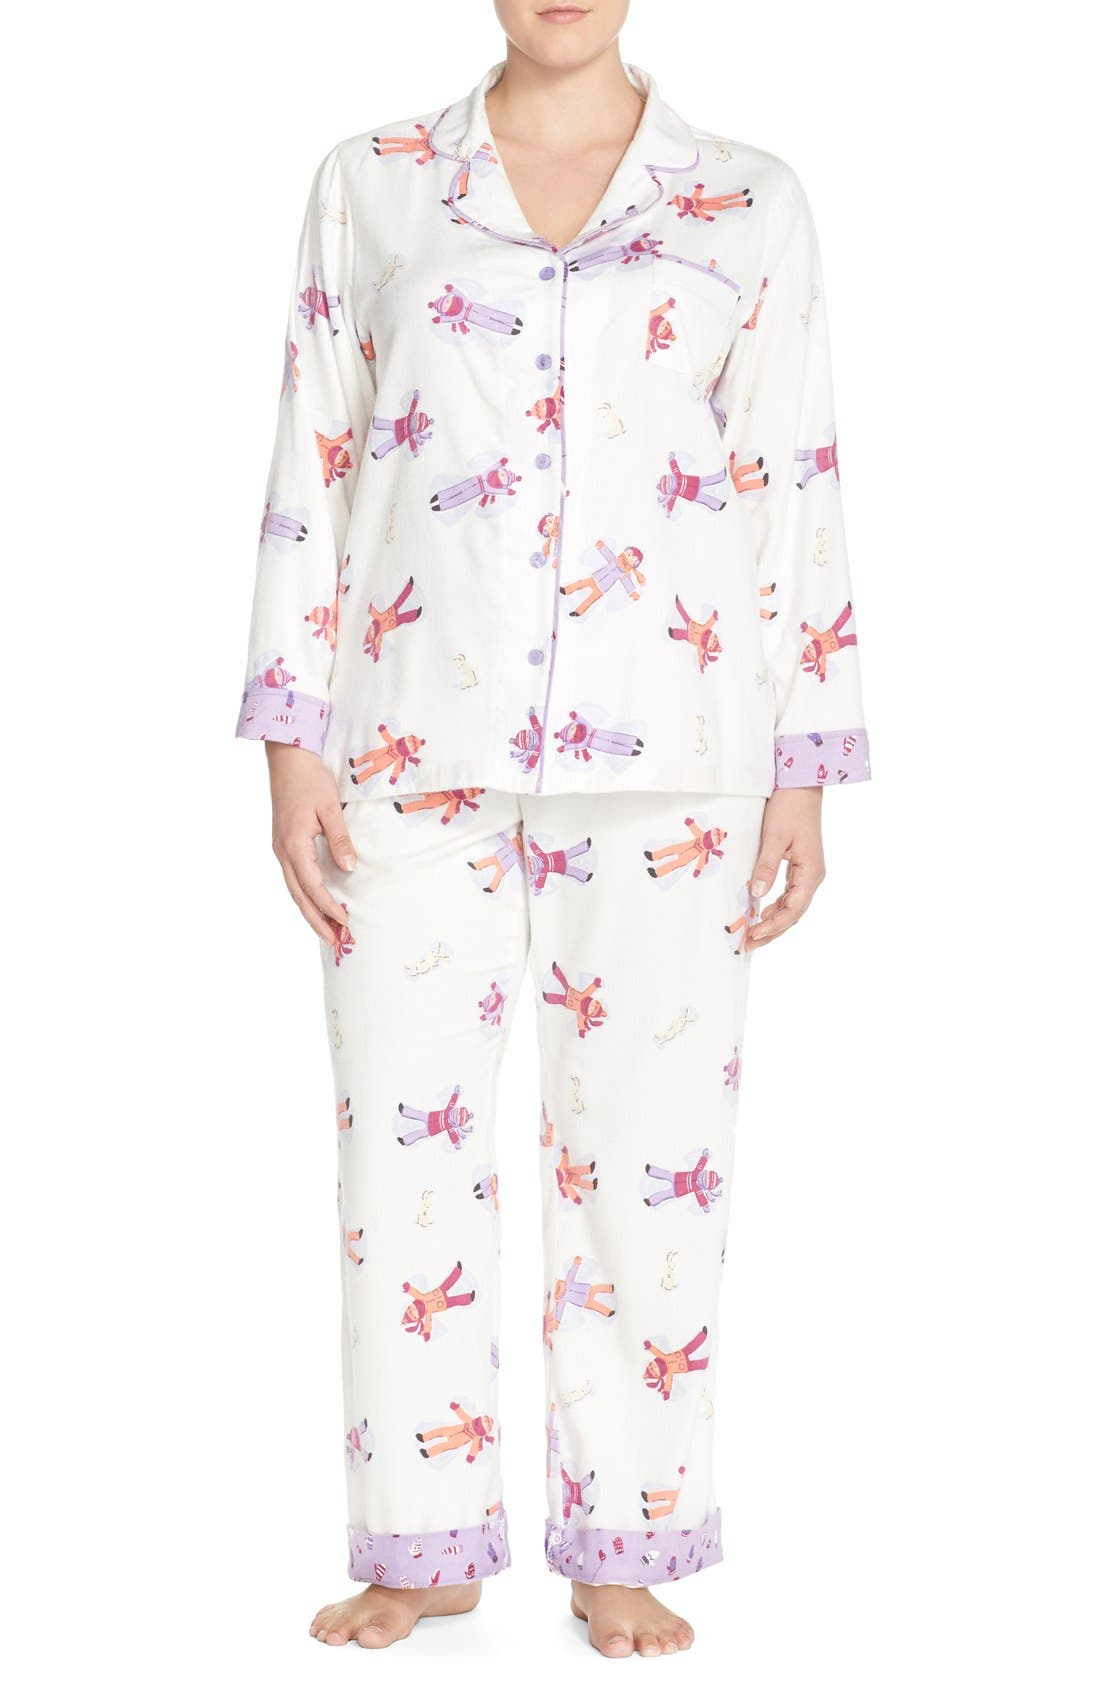 MUNKI MUNKI MunkiMunkiFlannel Pajamas, Main, color, 113